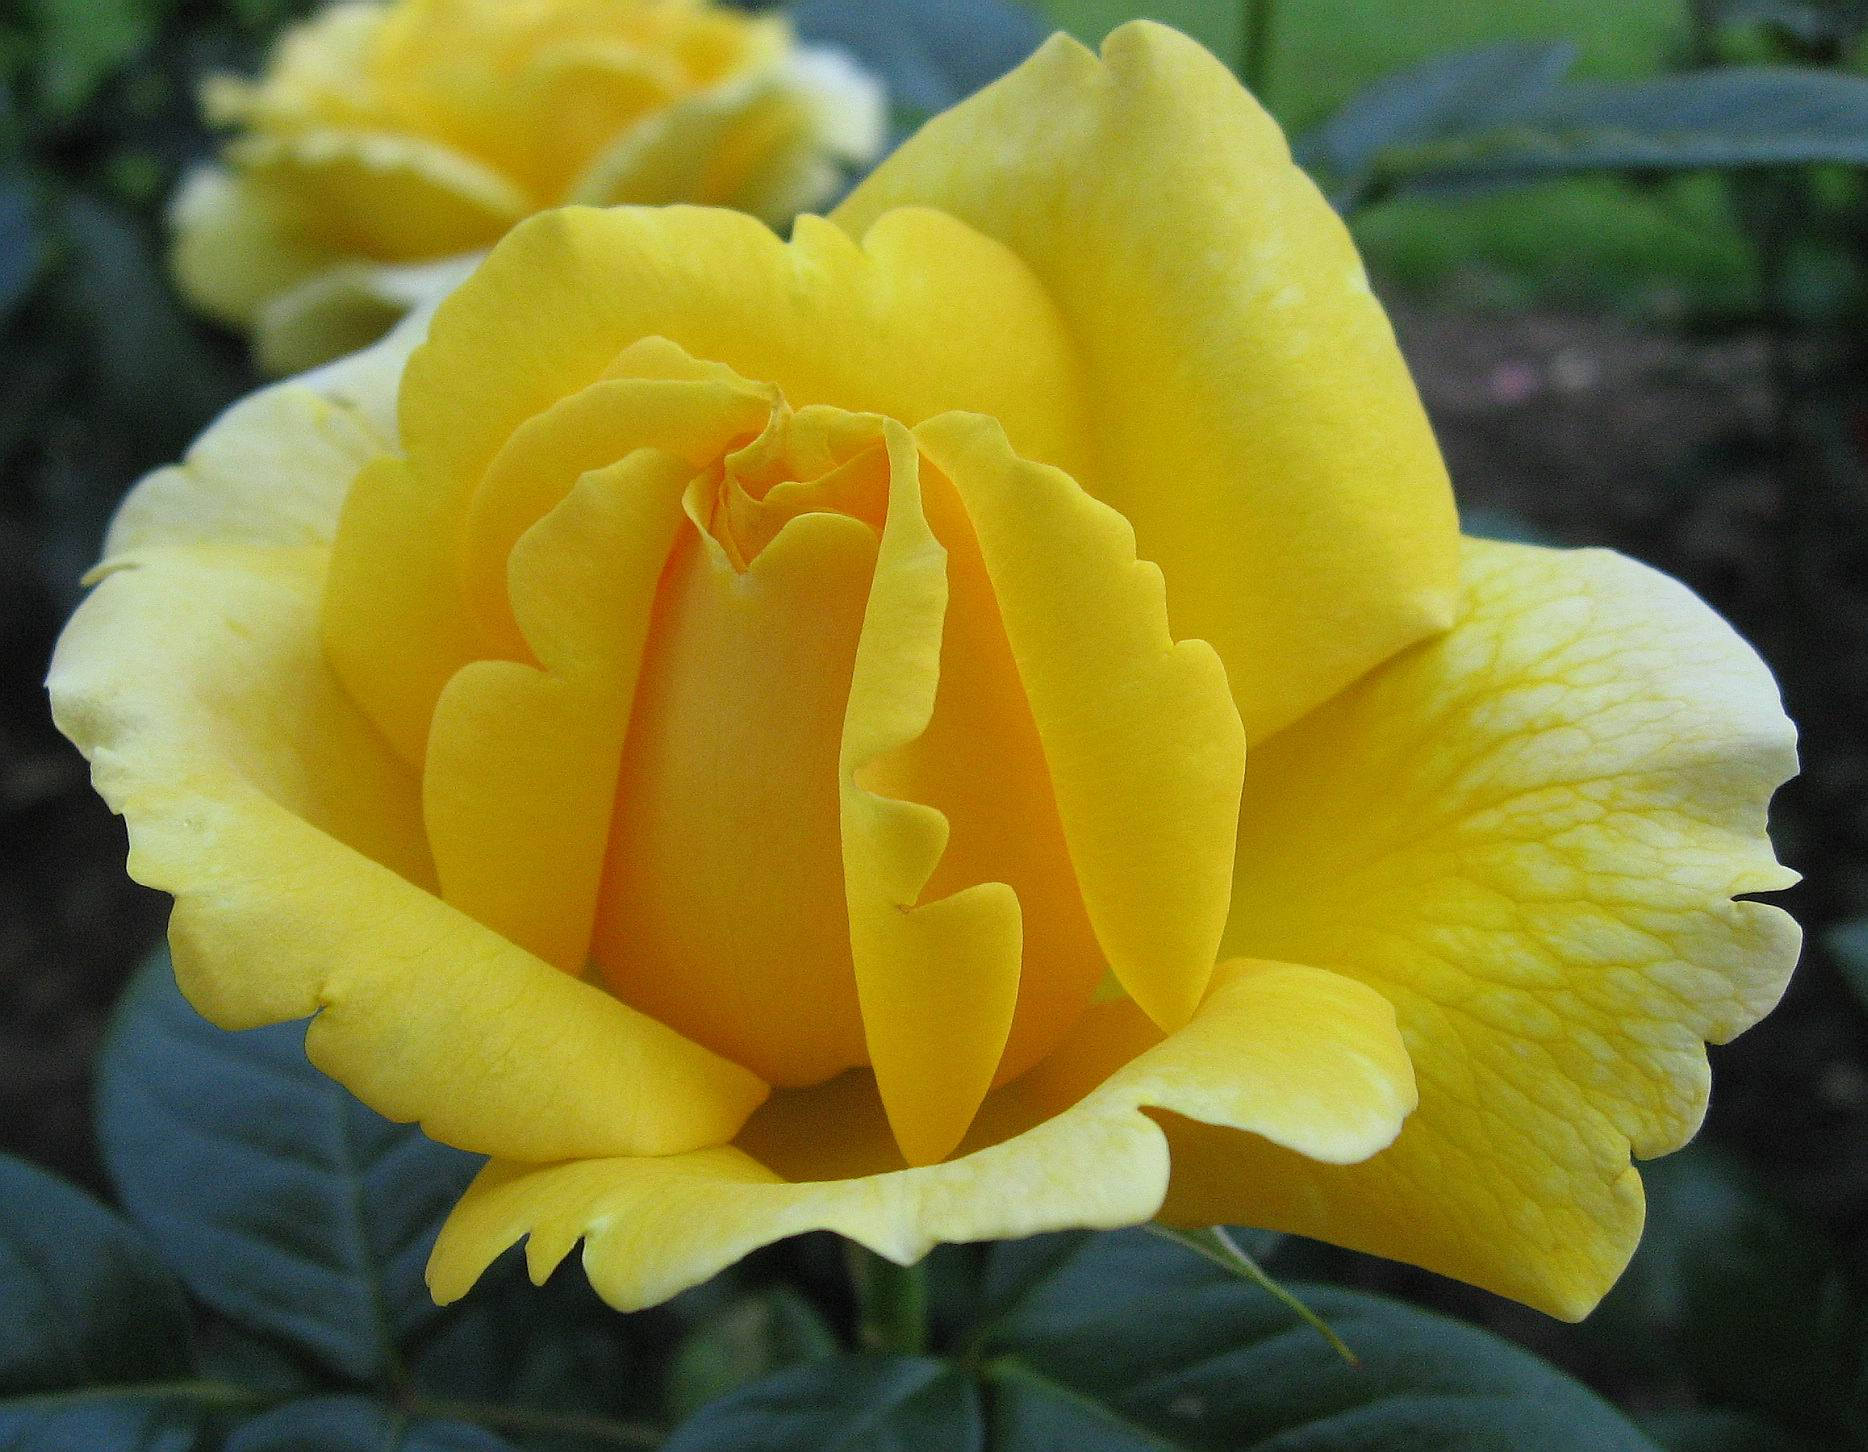 صوره صور ورد صور ورد , اجمل صور الورد الجميل